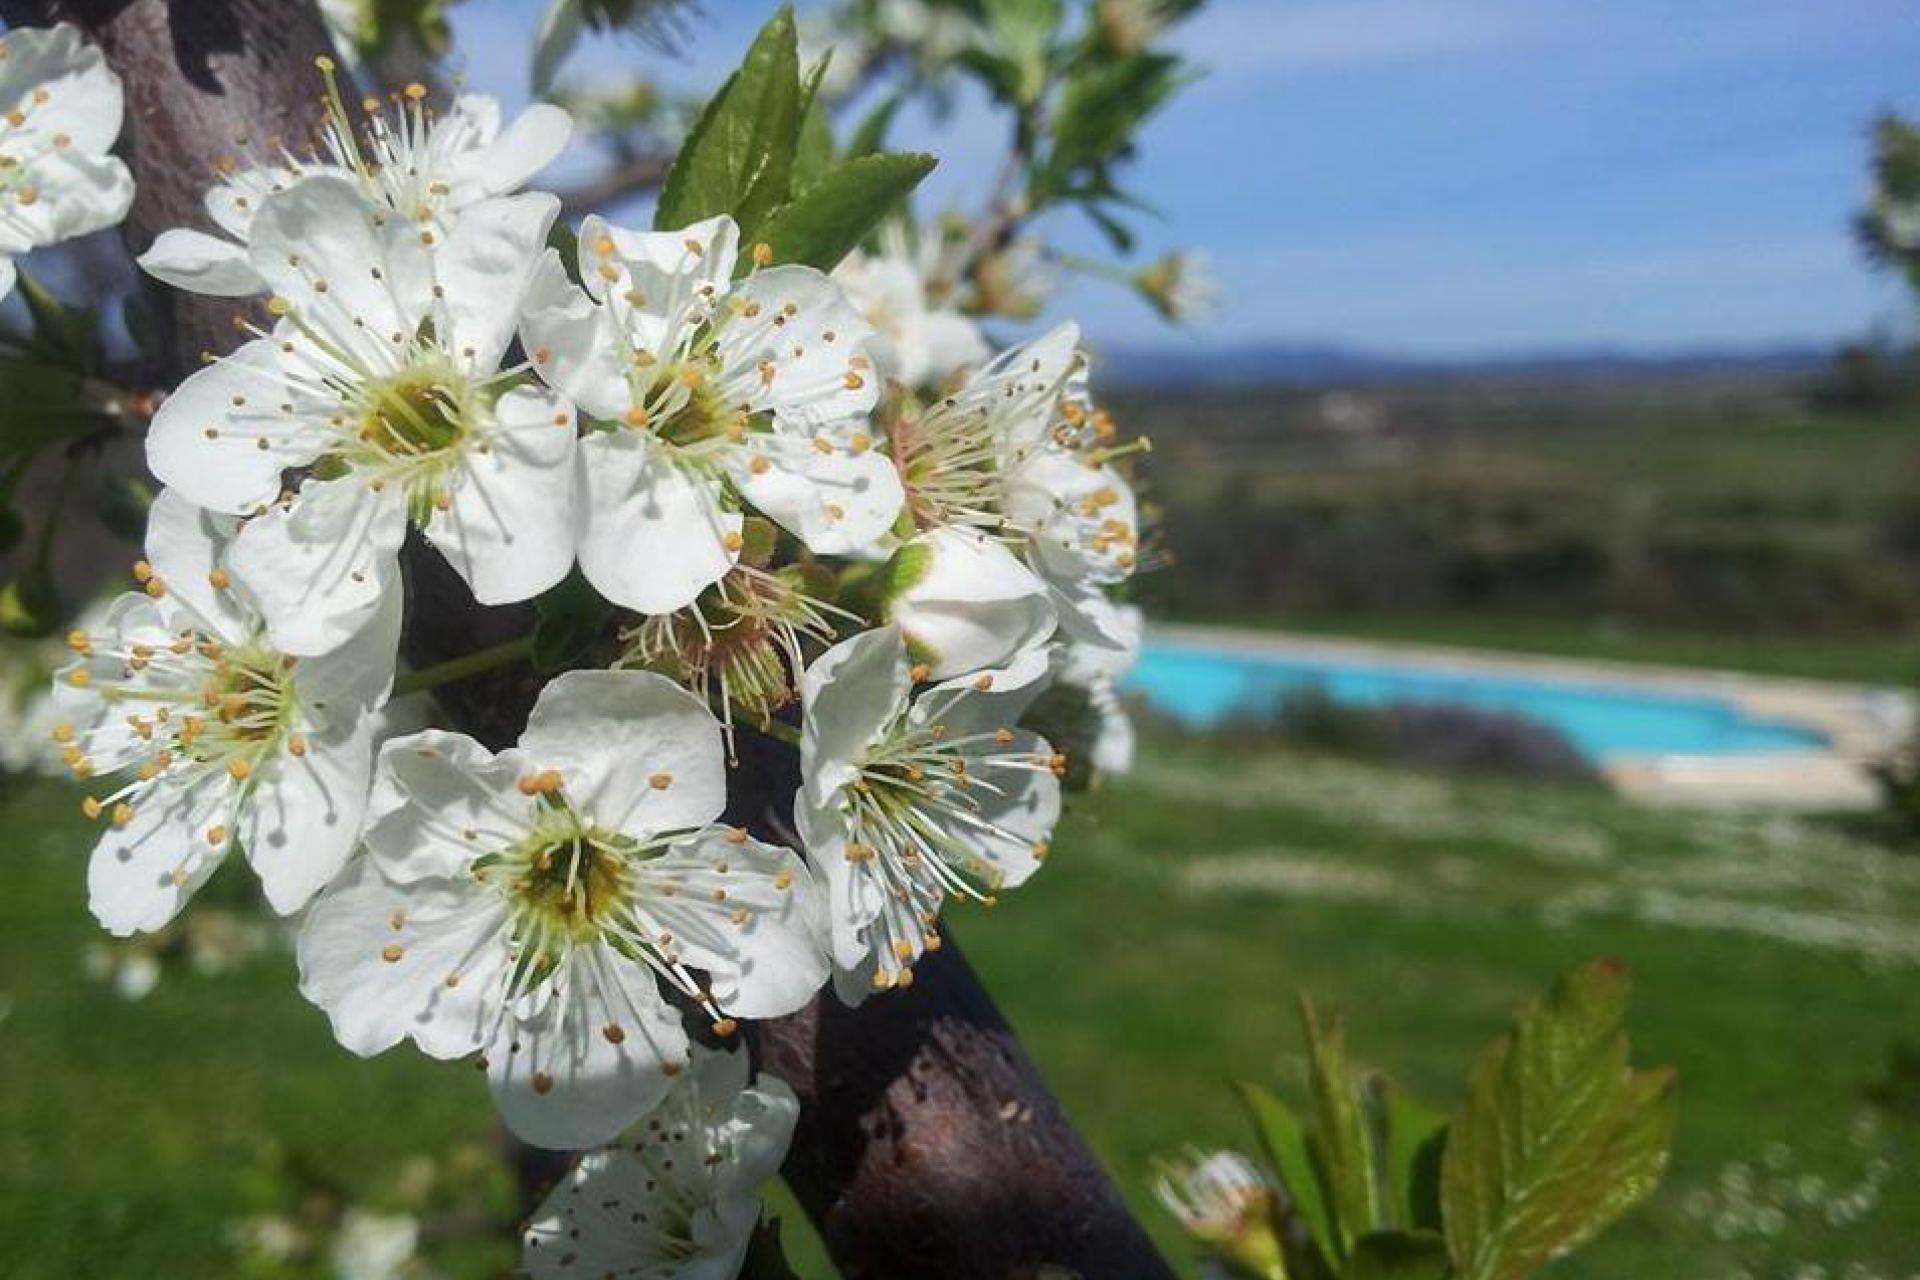 Agriturismo Toscana Agriturismo tranquillo tra olivi vicino al mare, Toscana